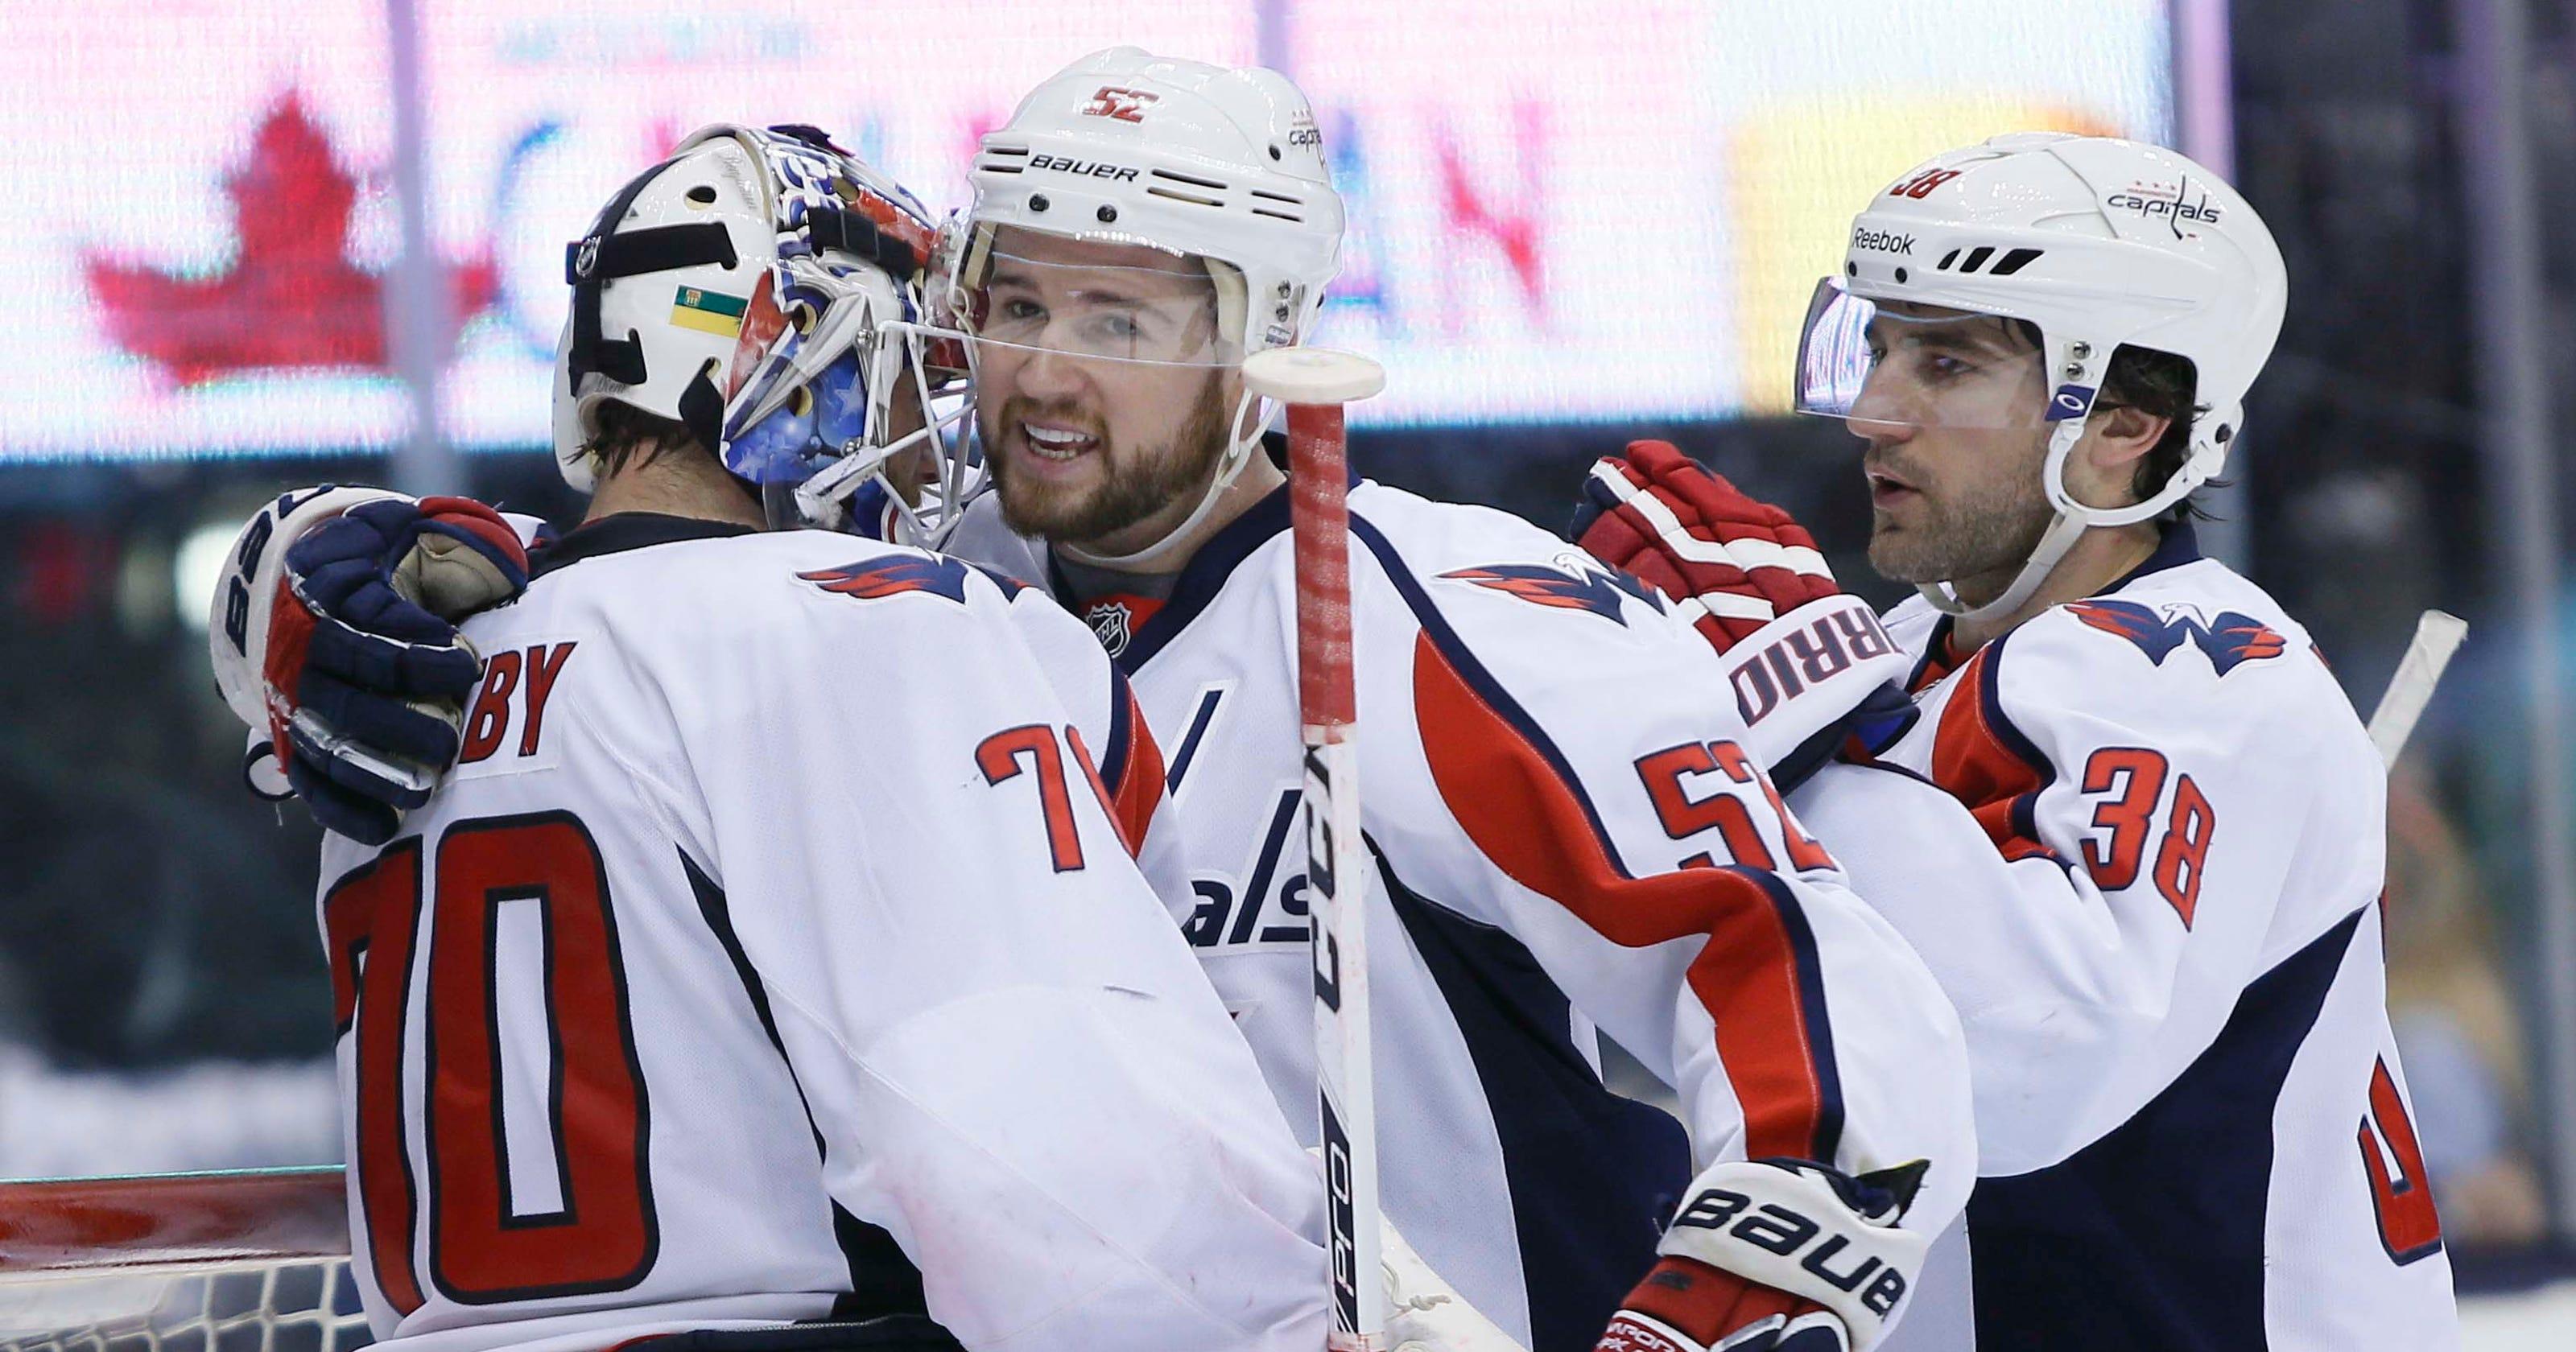 1145636ea4e Maple Leafs beaten 6-2 by Capitals in Coach Horachek s debut